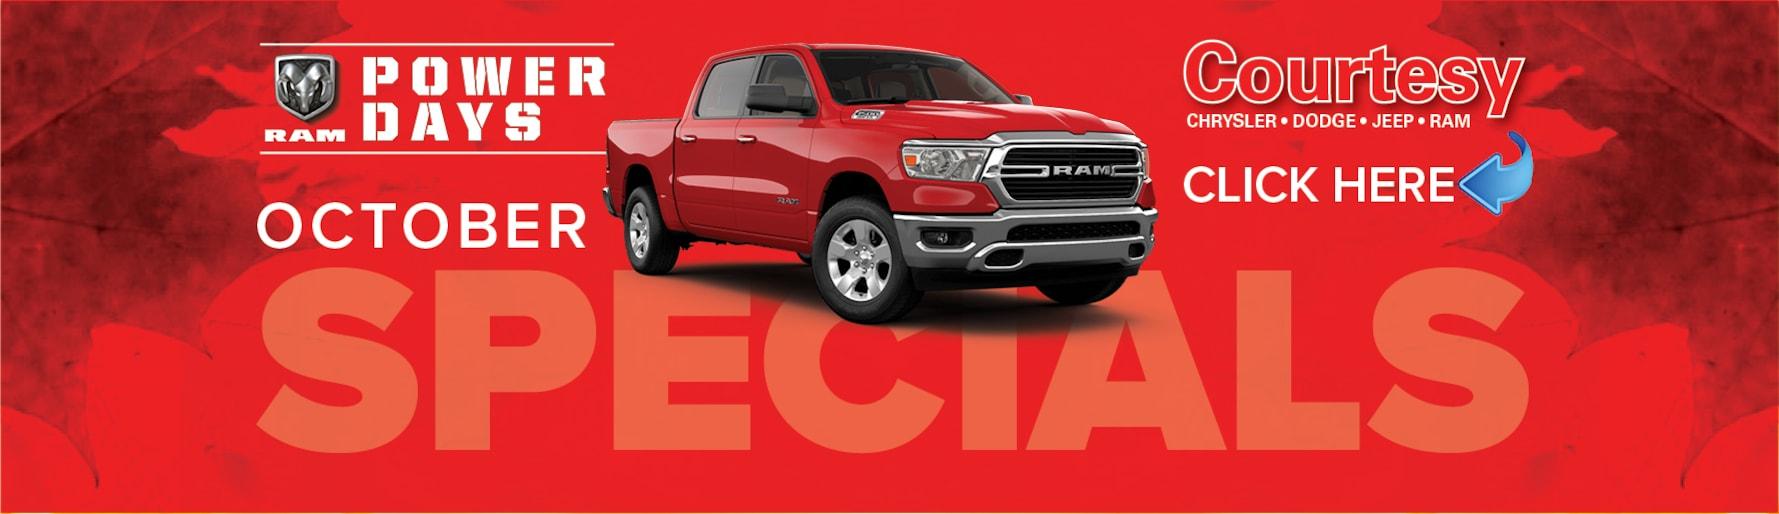 Jeep Dealership Grand Rapids Mi >> New & Used Car Dealer   Grand Rapids, MI   Courtesy CDJR